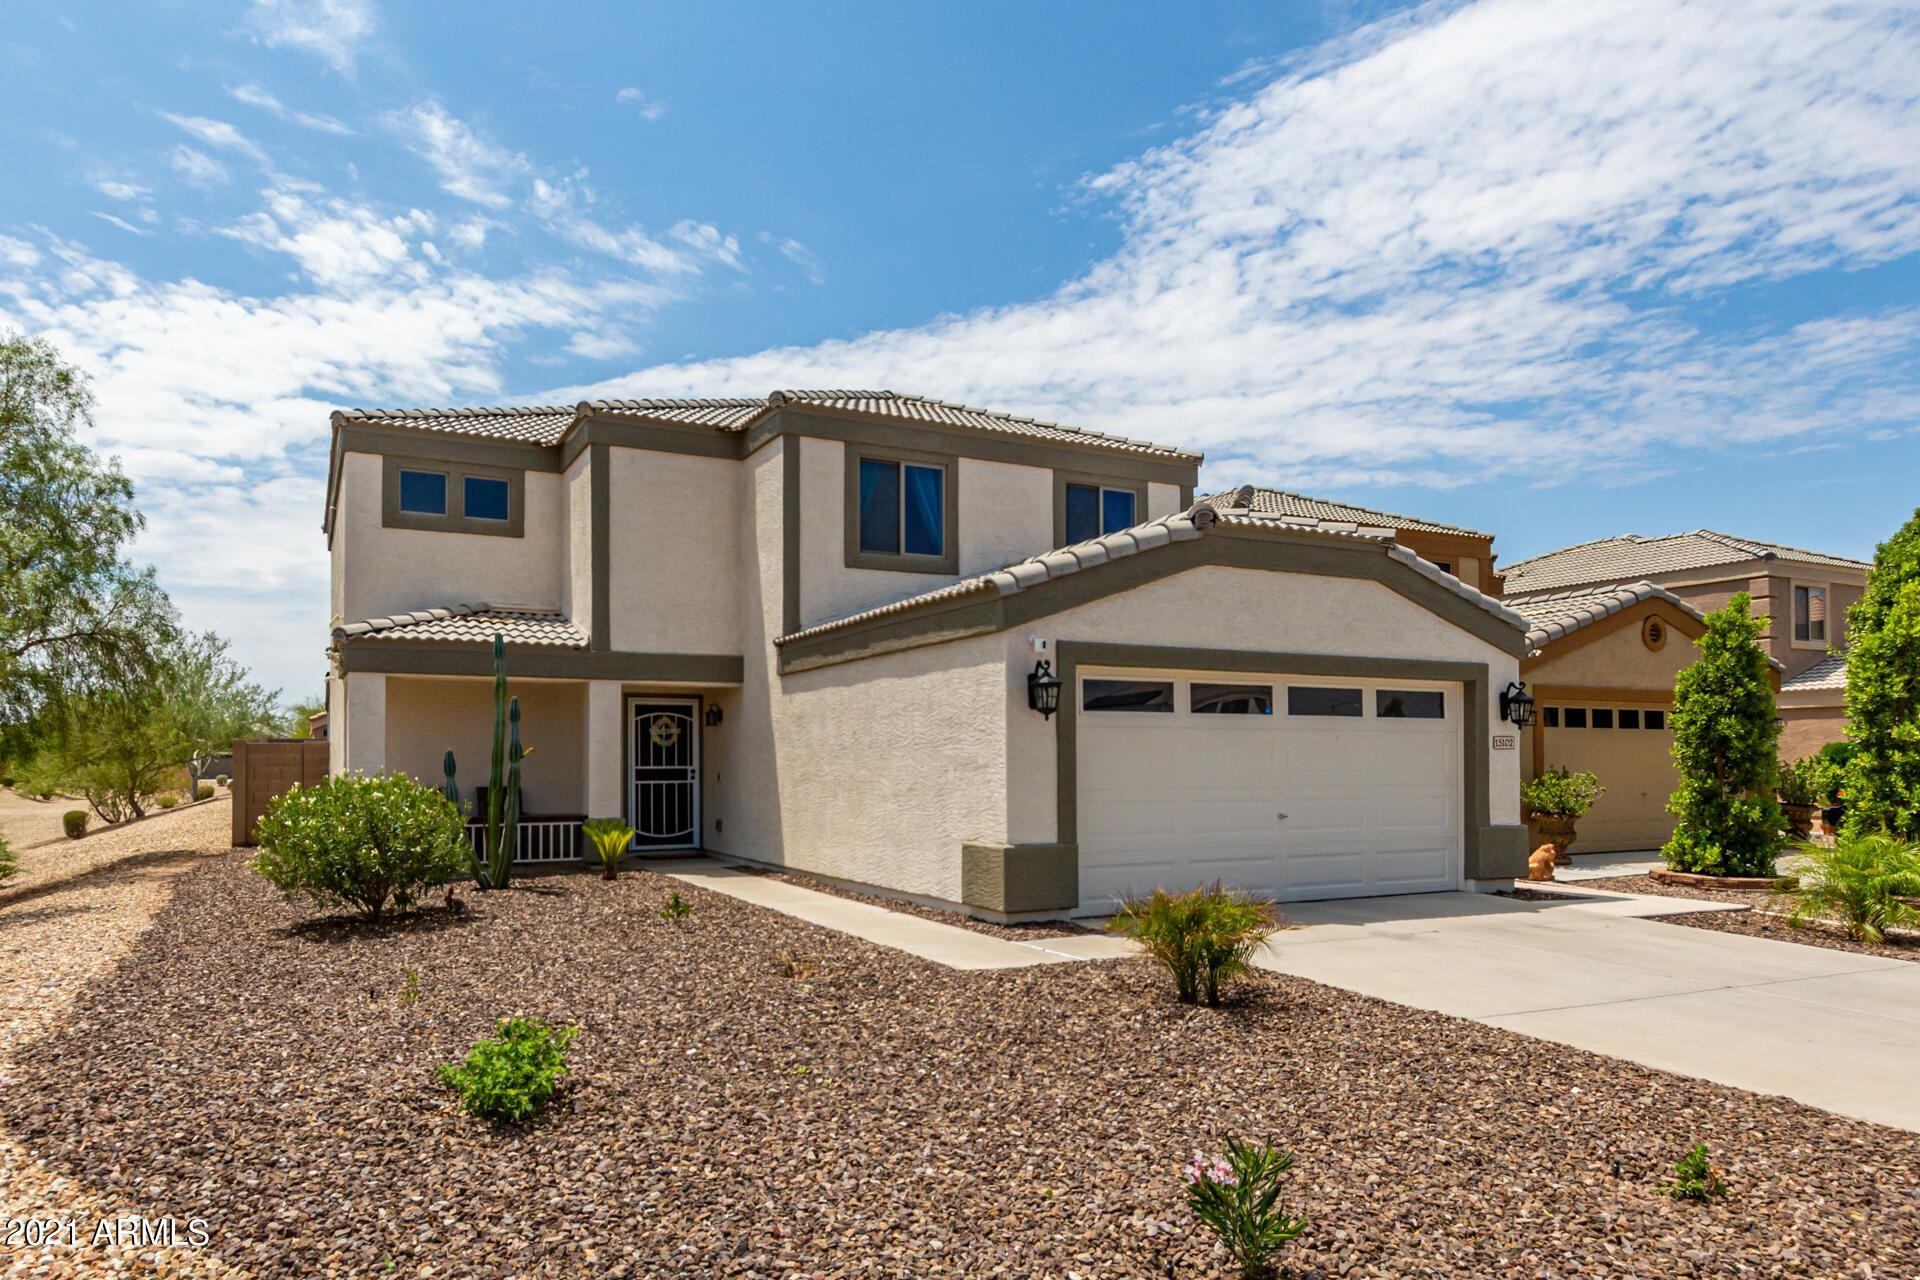 Photo of 15102 N A Court, El Mirage, AZ 85335 (MLS # 6266546)